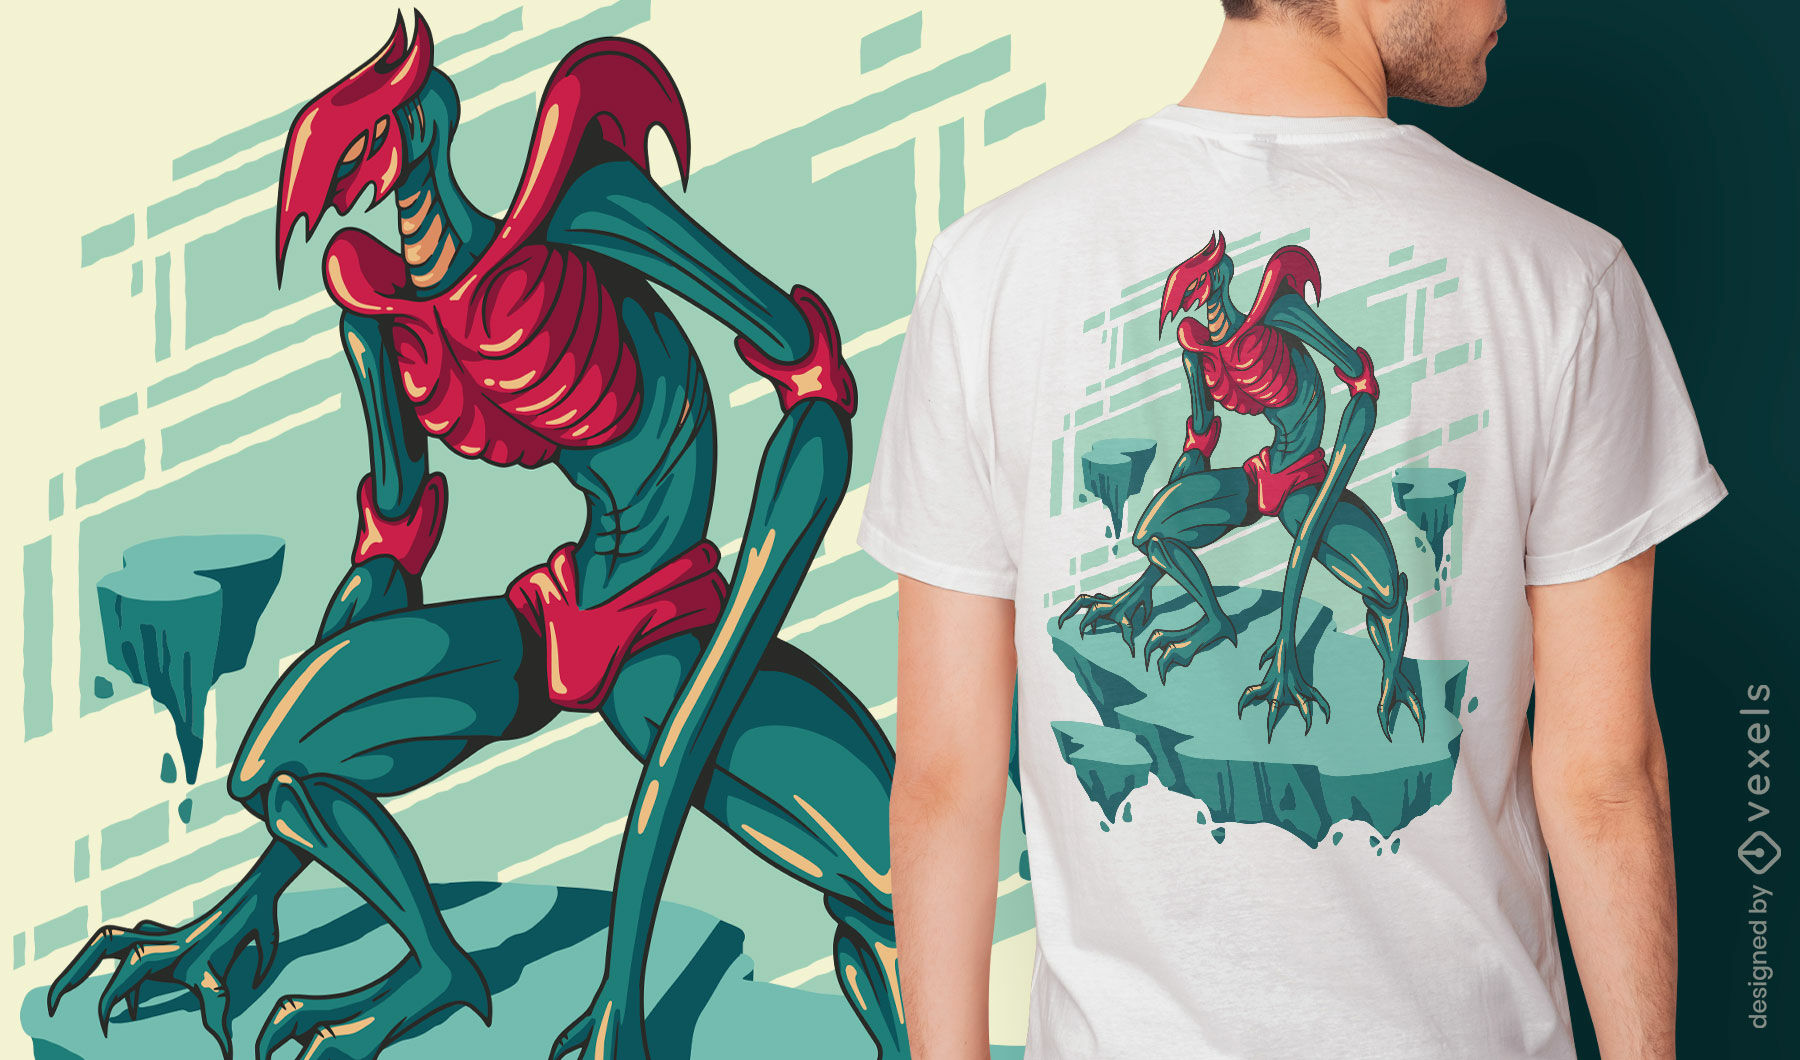 Diseño de camiseta de monstruo de pesadilla esqueleto.